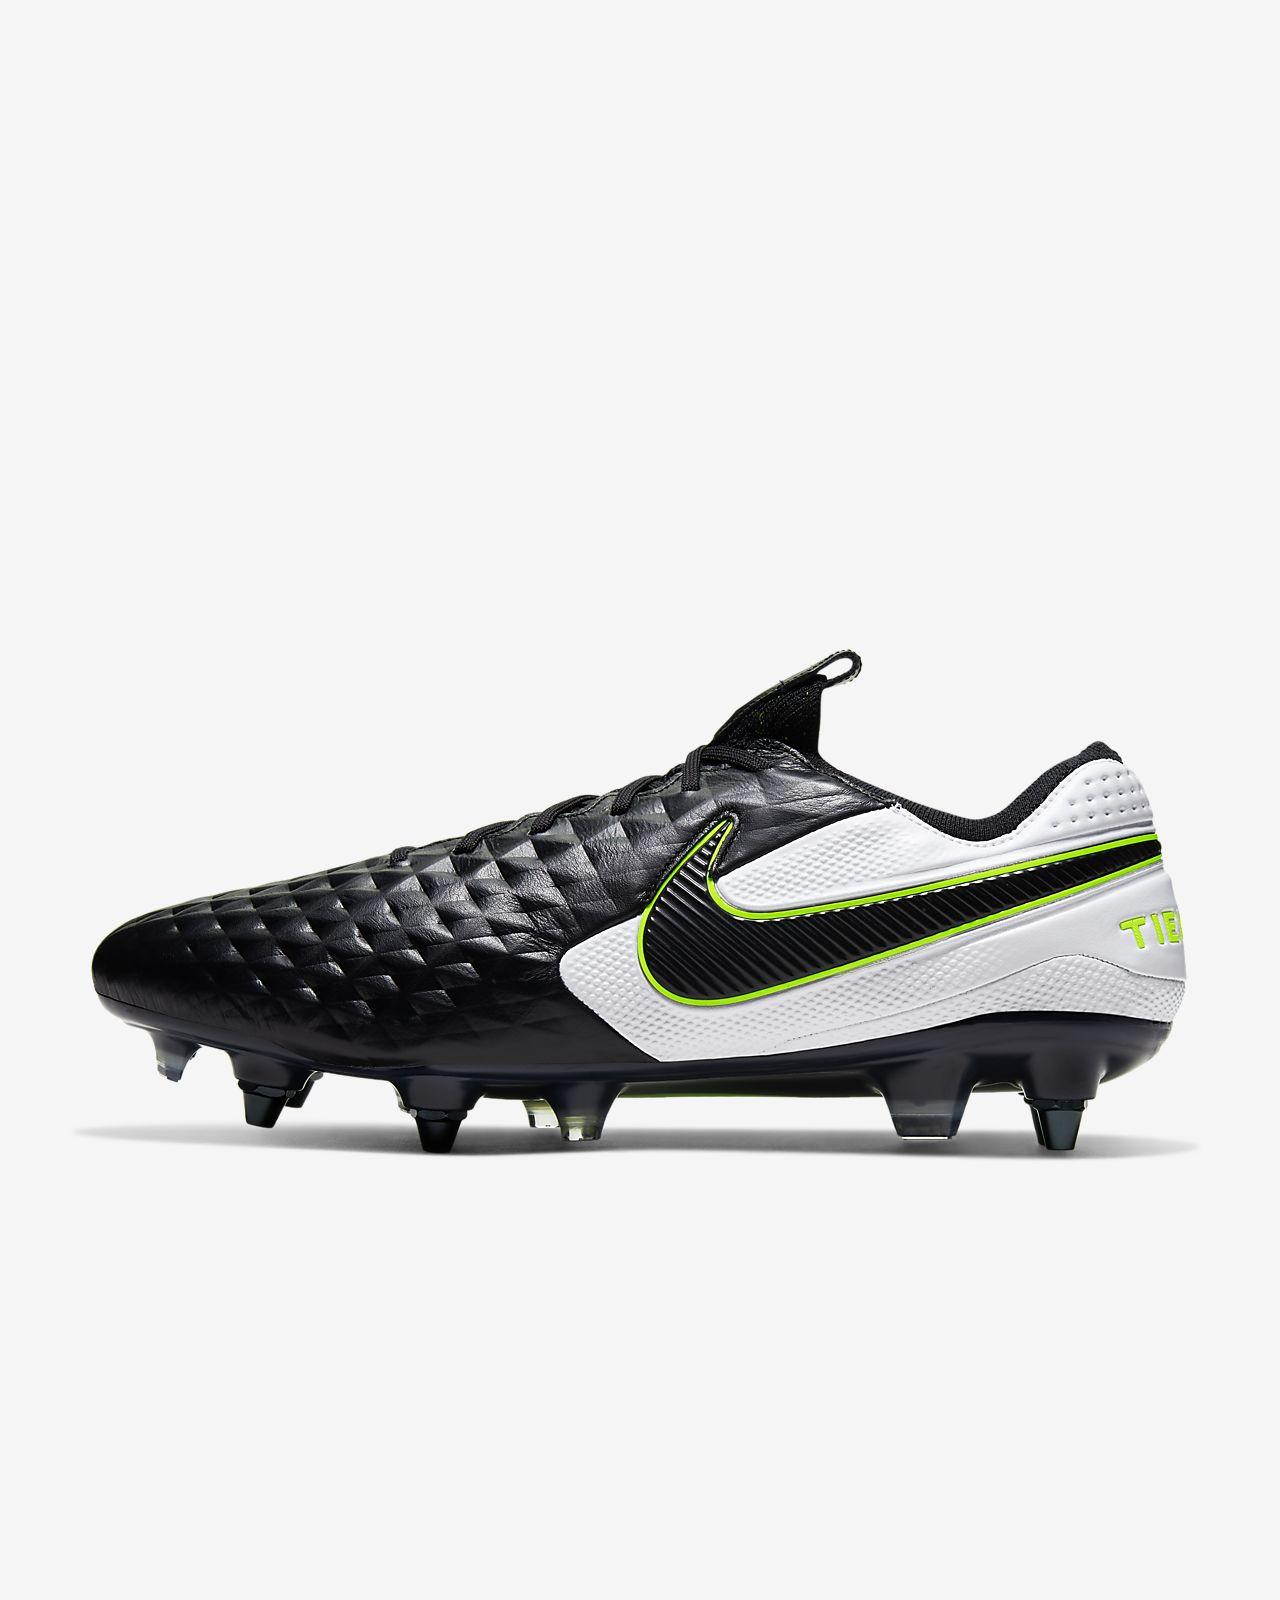 Nike Tiempo Legend 8 Elite SG-PRO Anti-Clog Traction Soft-Ground Football Boot